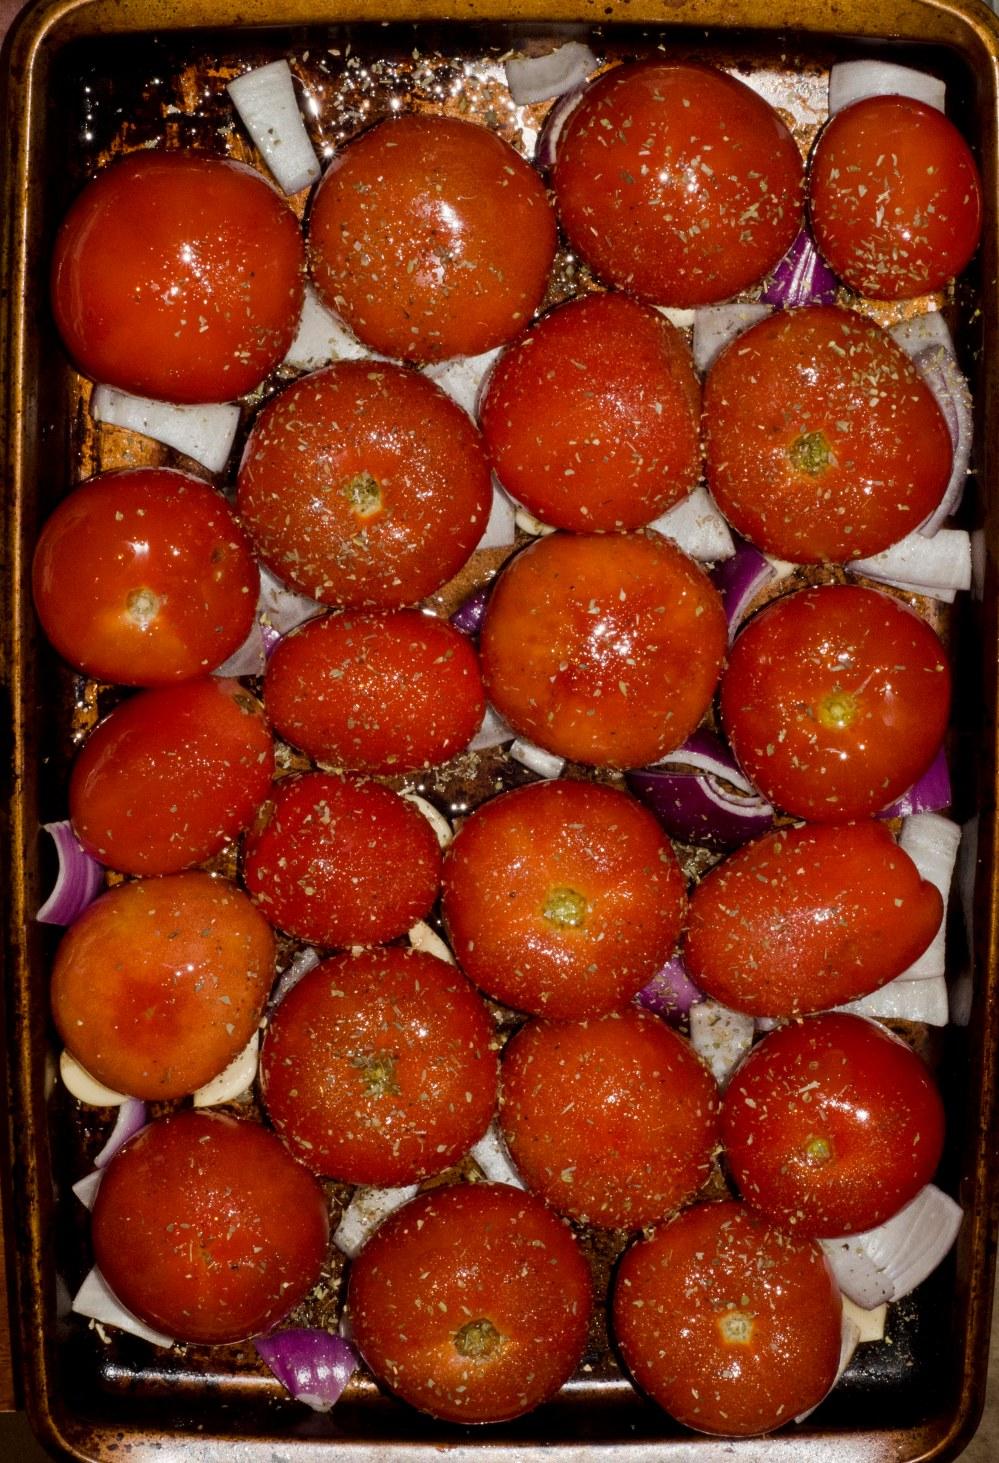 Roasted_tomatoes_1.jpg